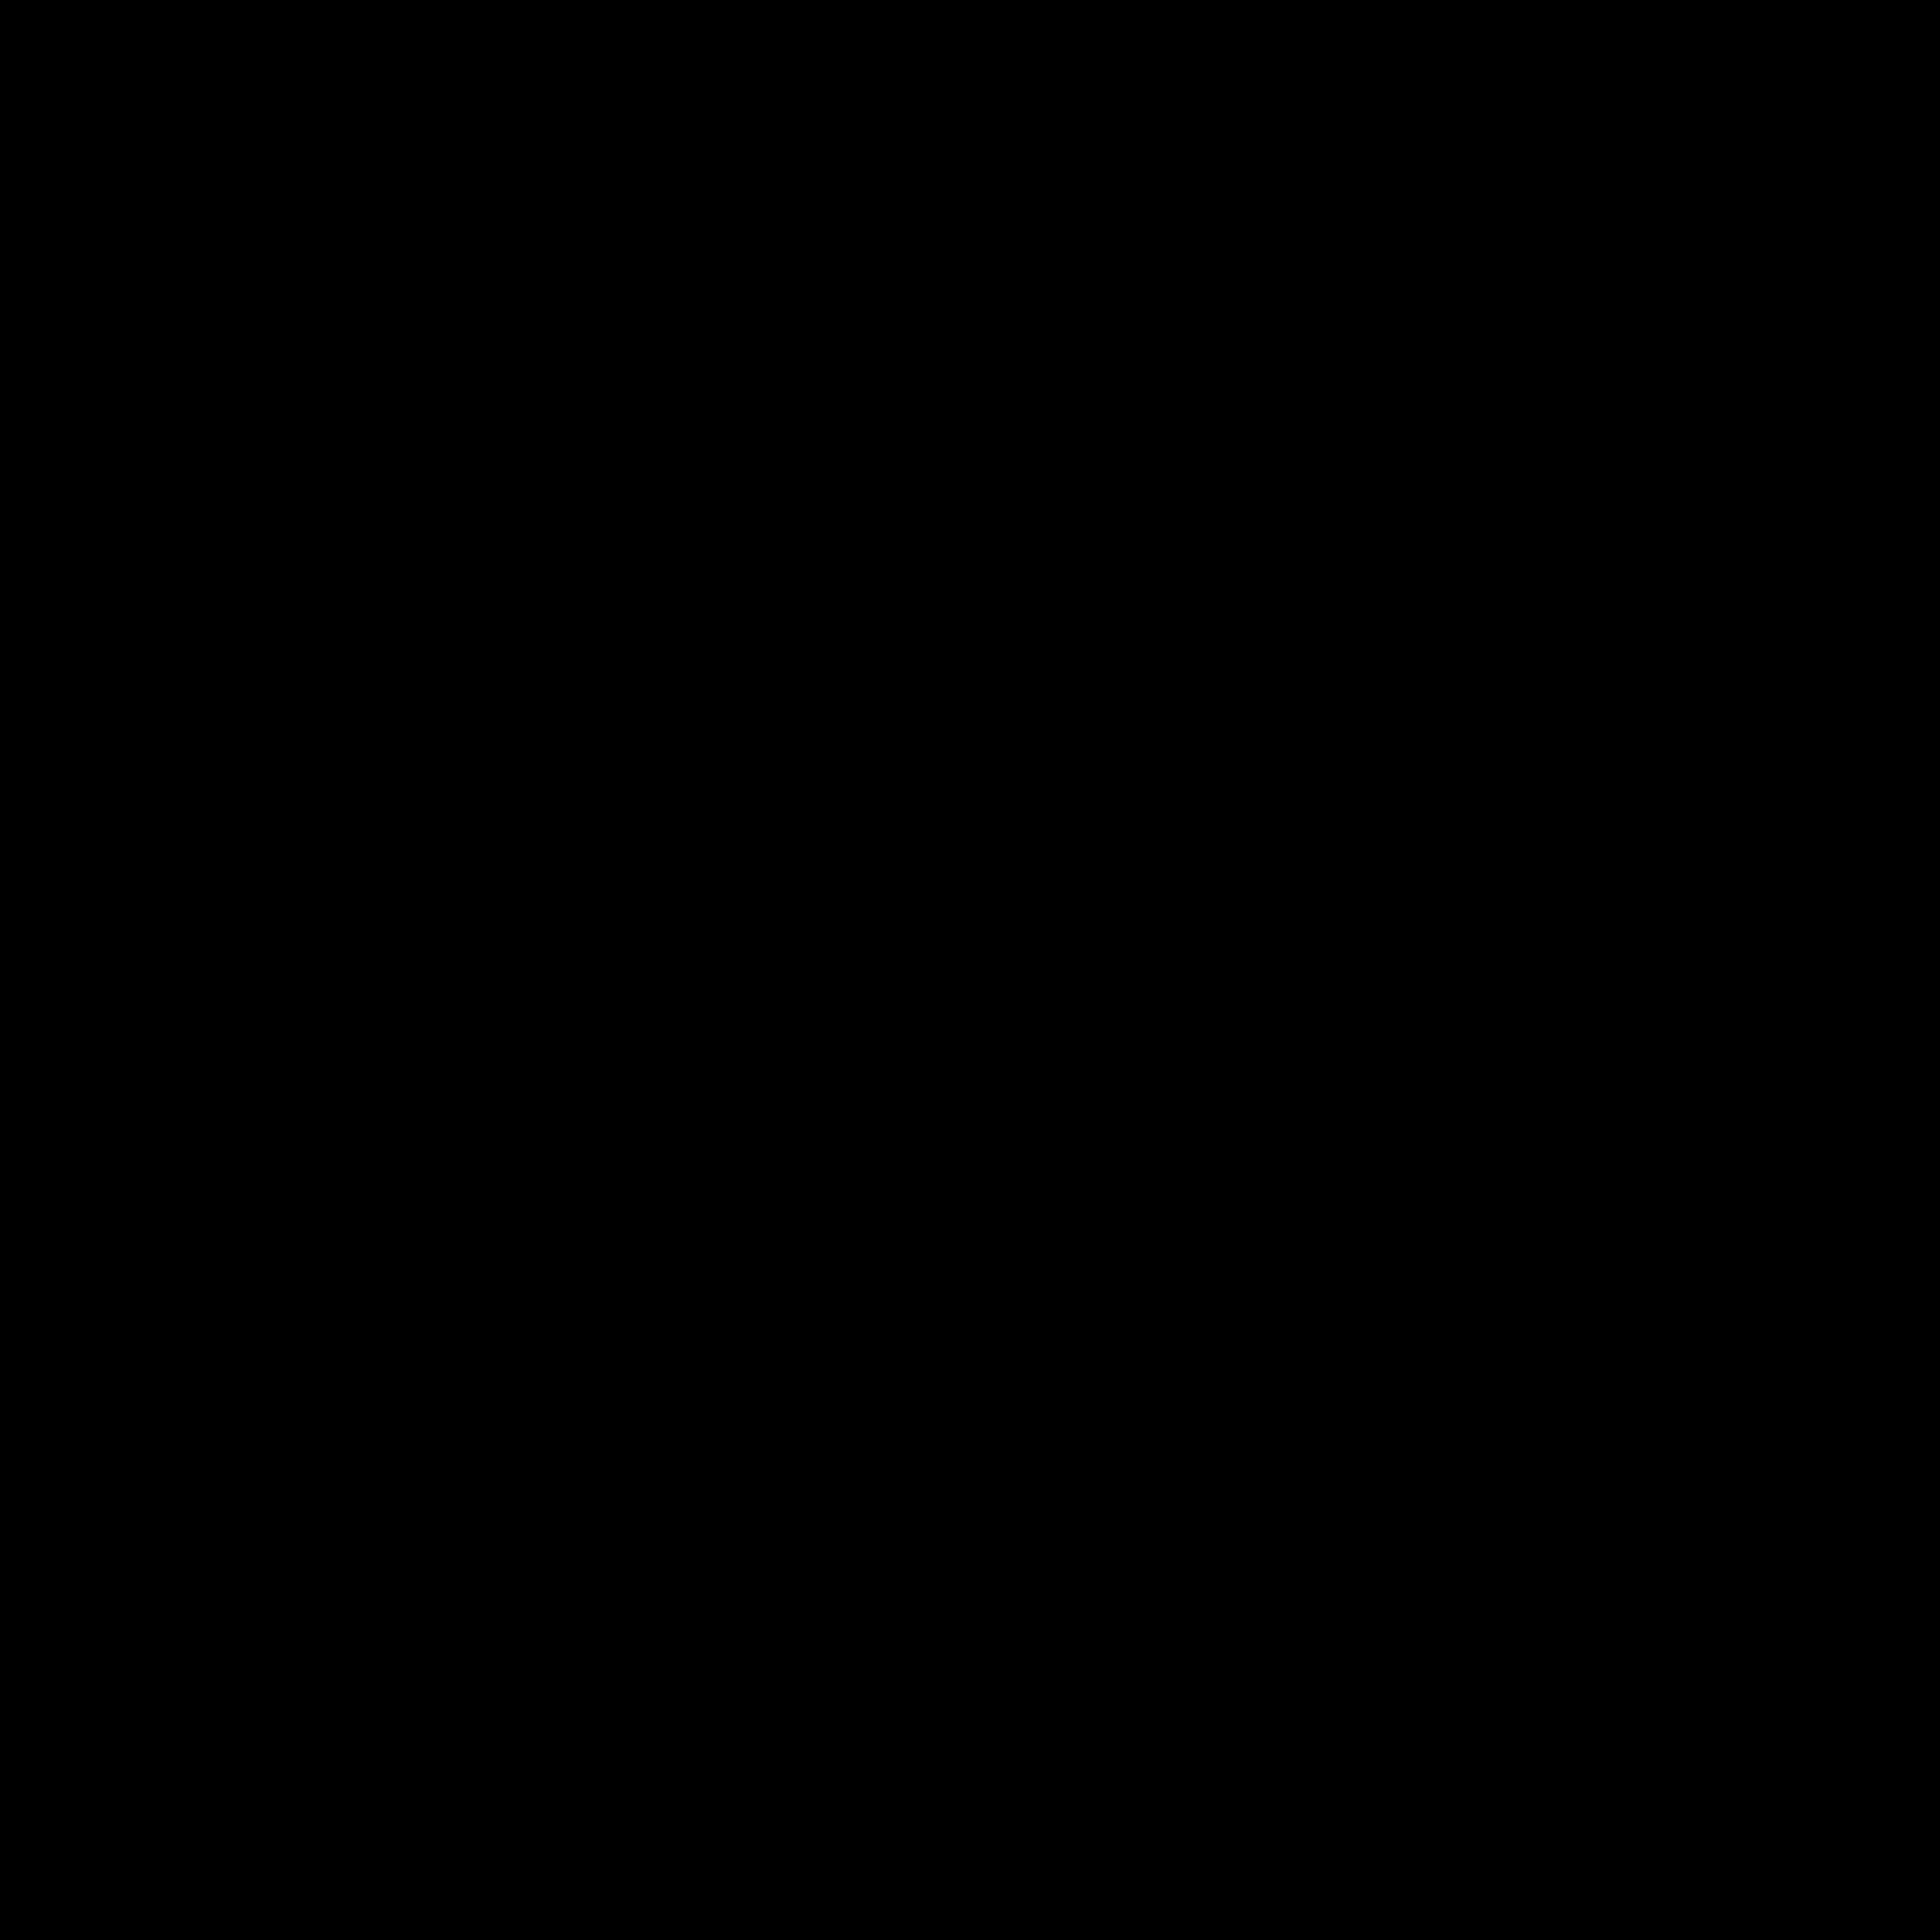 clip free Pontiac logo png transparent. Vector emblem racing